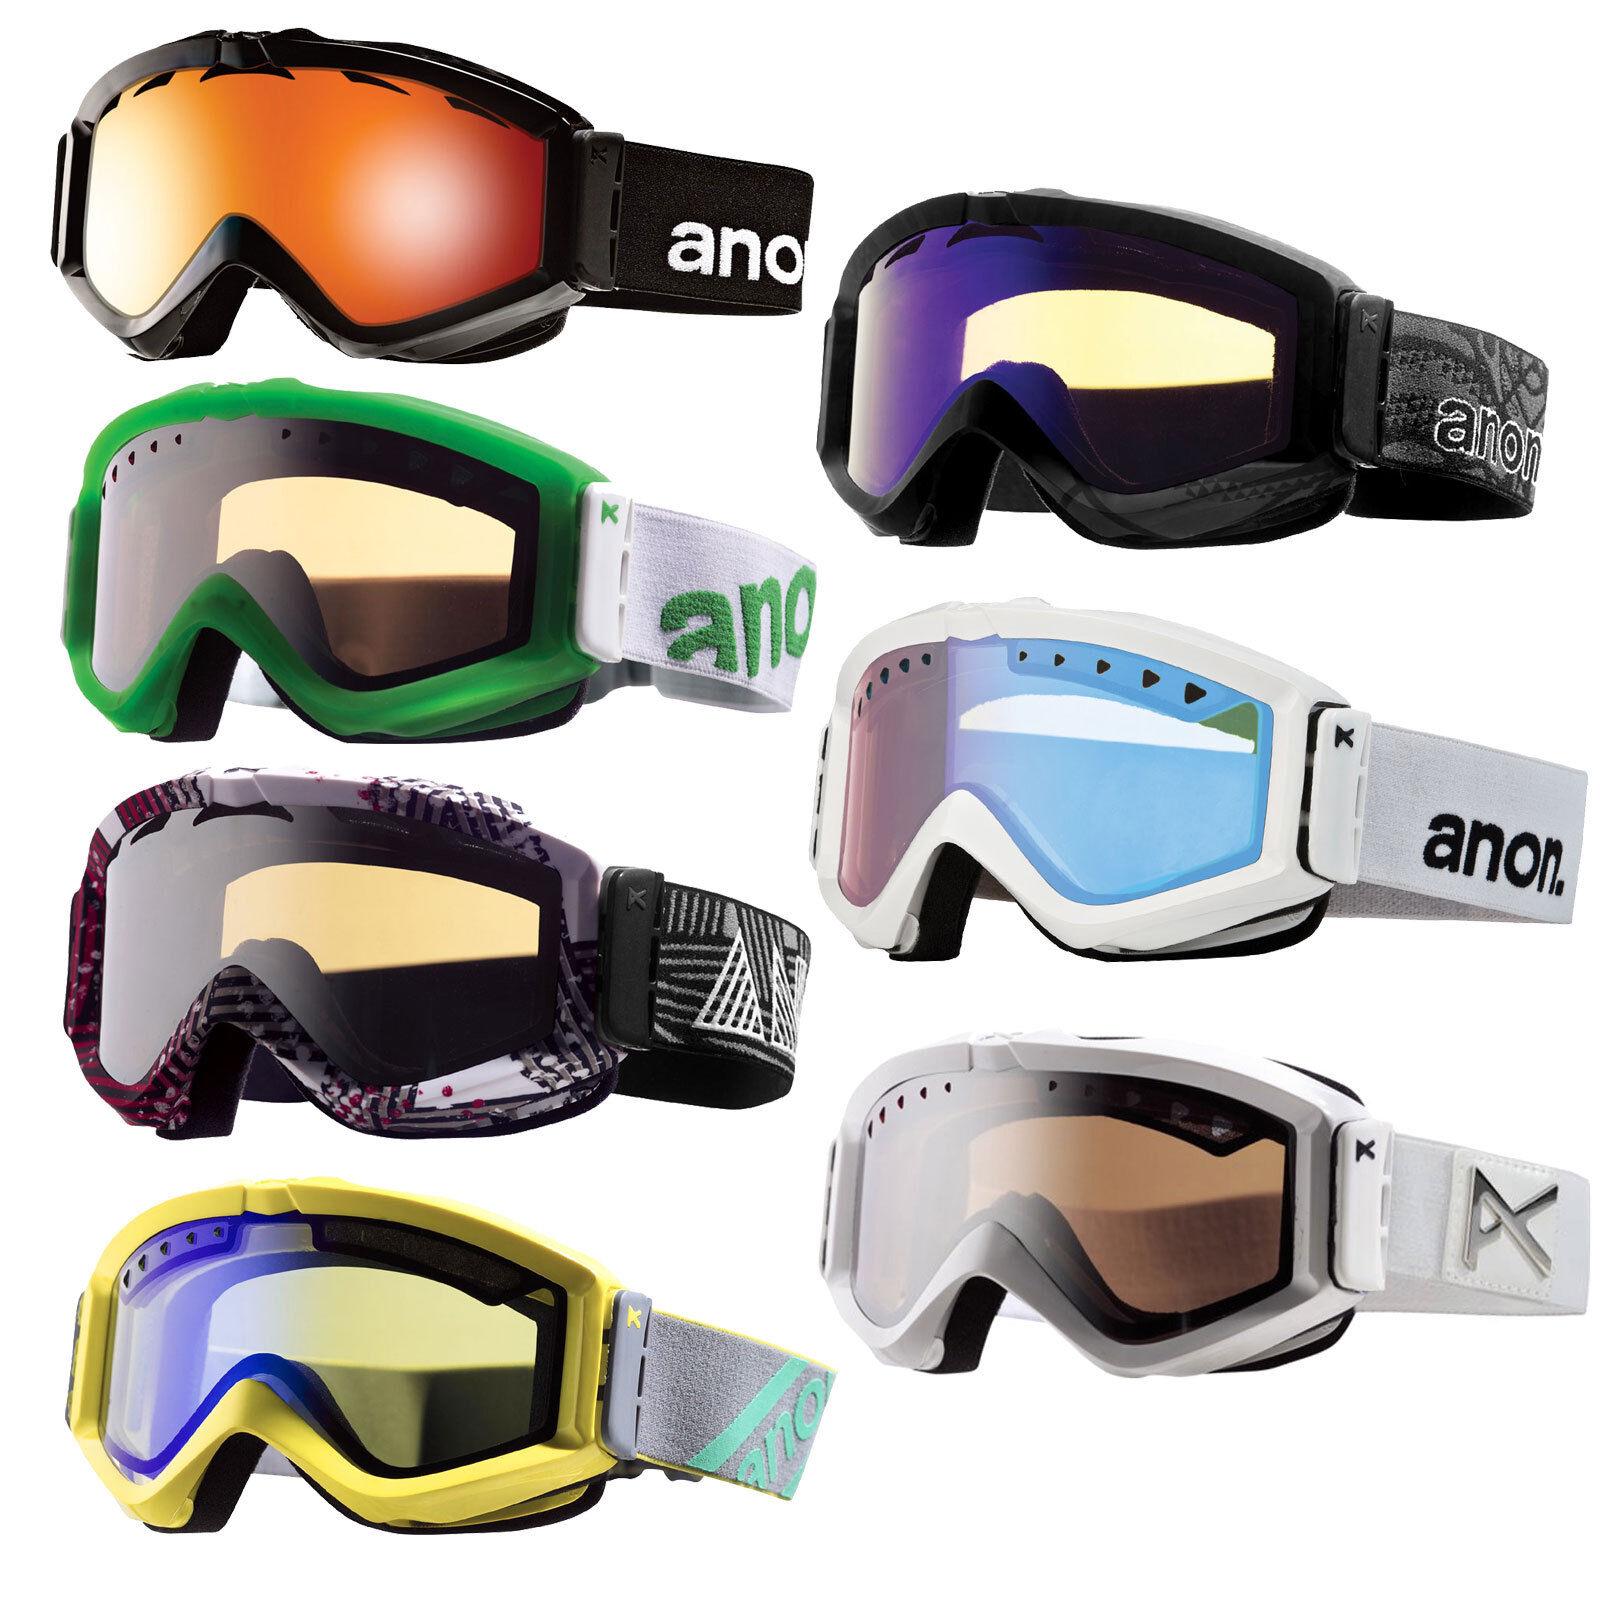 Anon Figment Ski Goggles Snowboard Glasses Goggle Glasses Snow Glasses